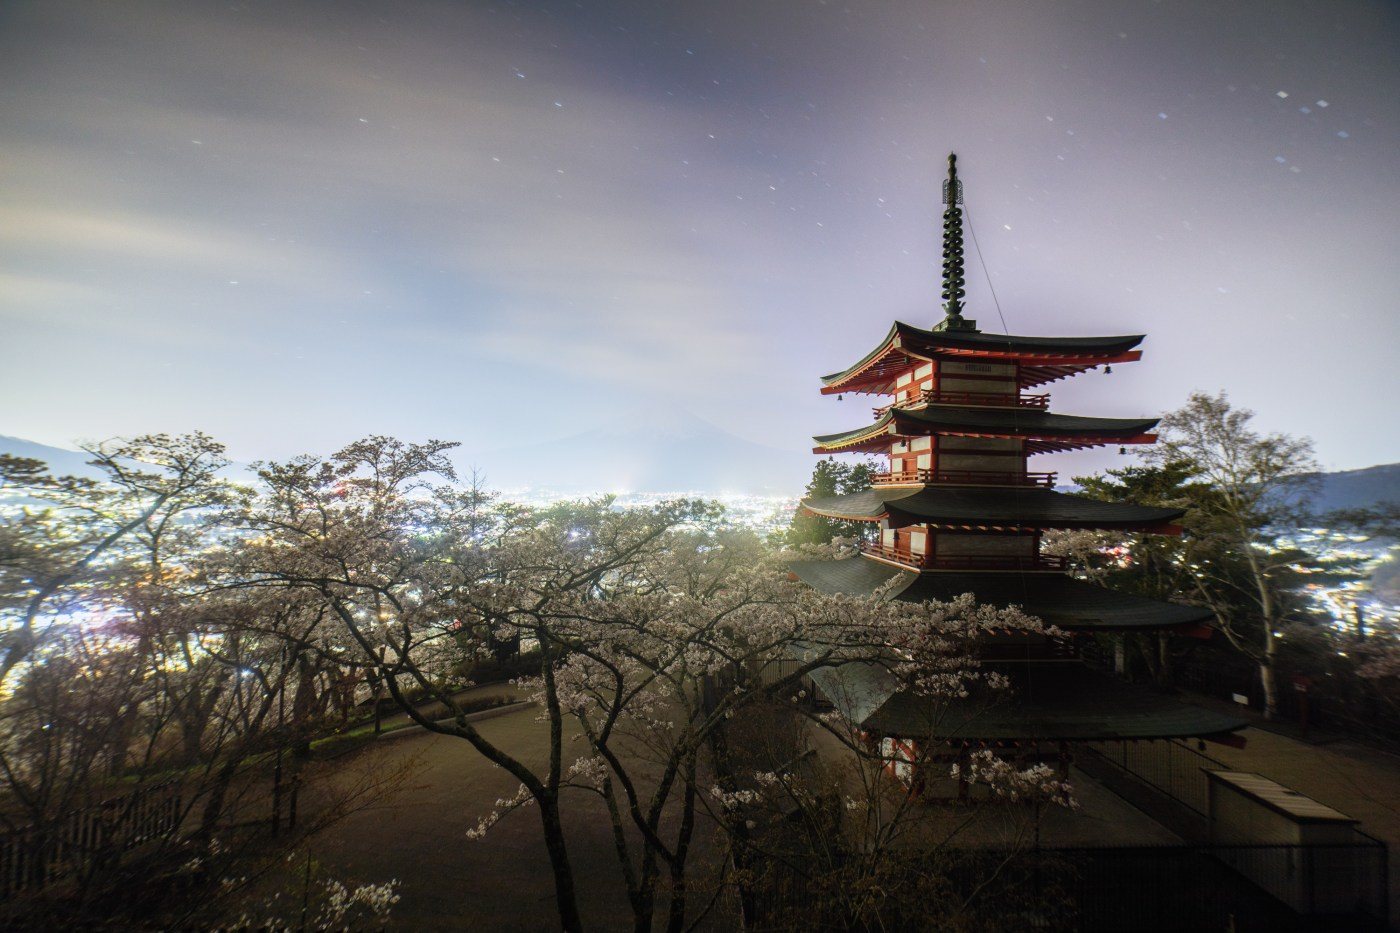 Night View from Chureito Pagoda, Fuji Lake Five Region